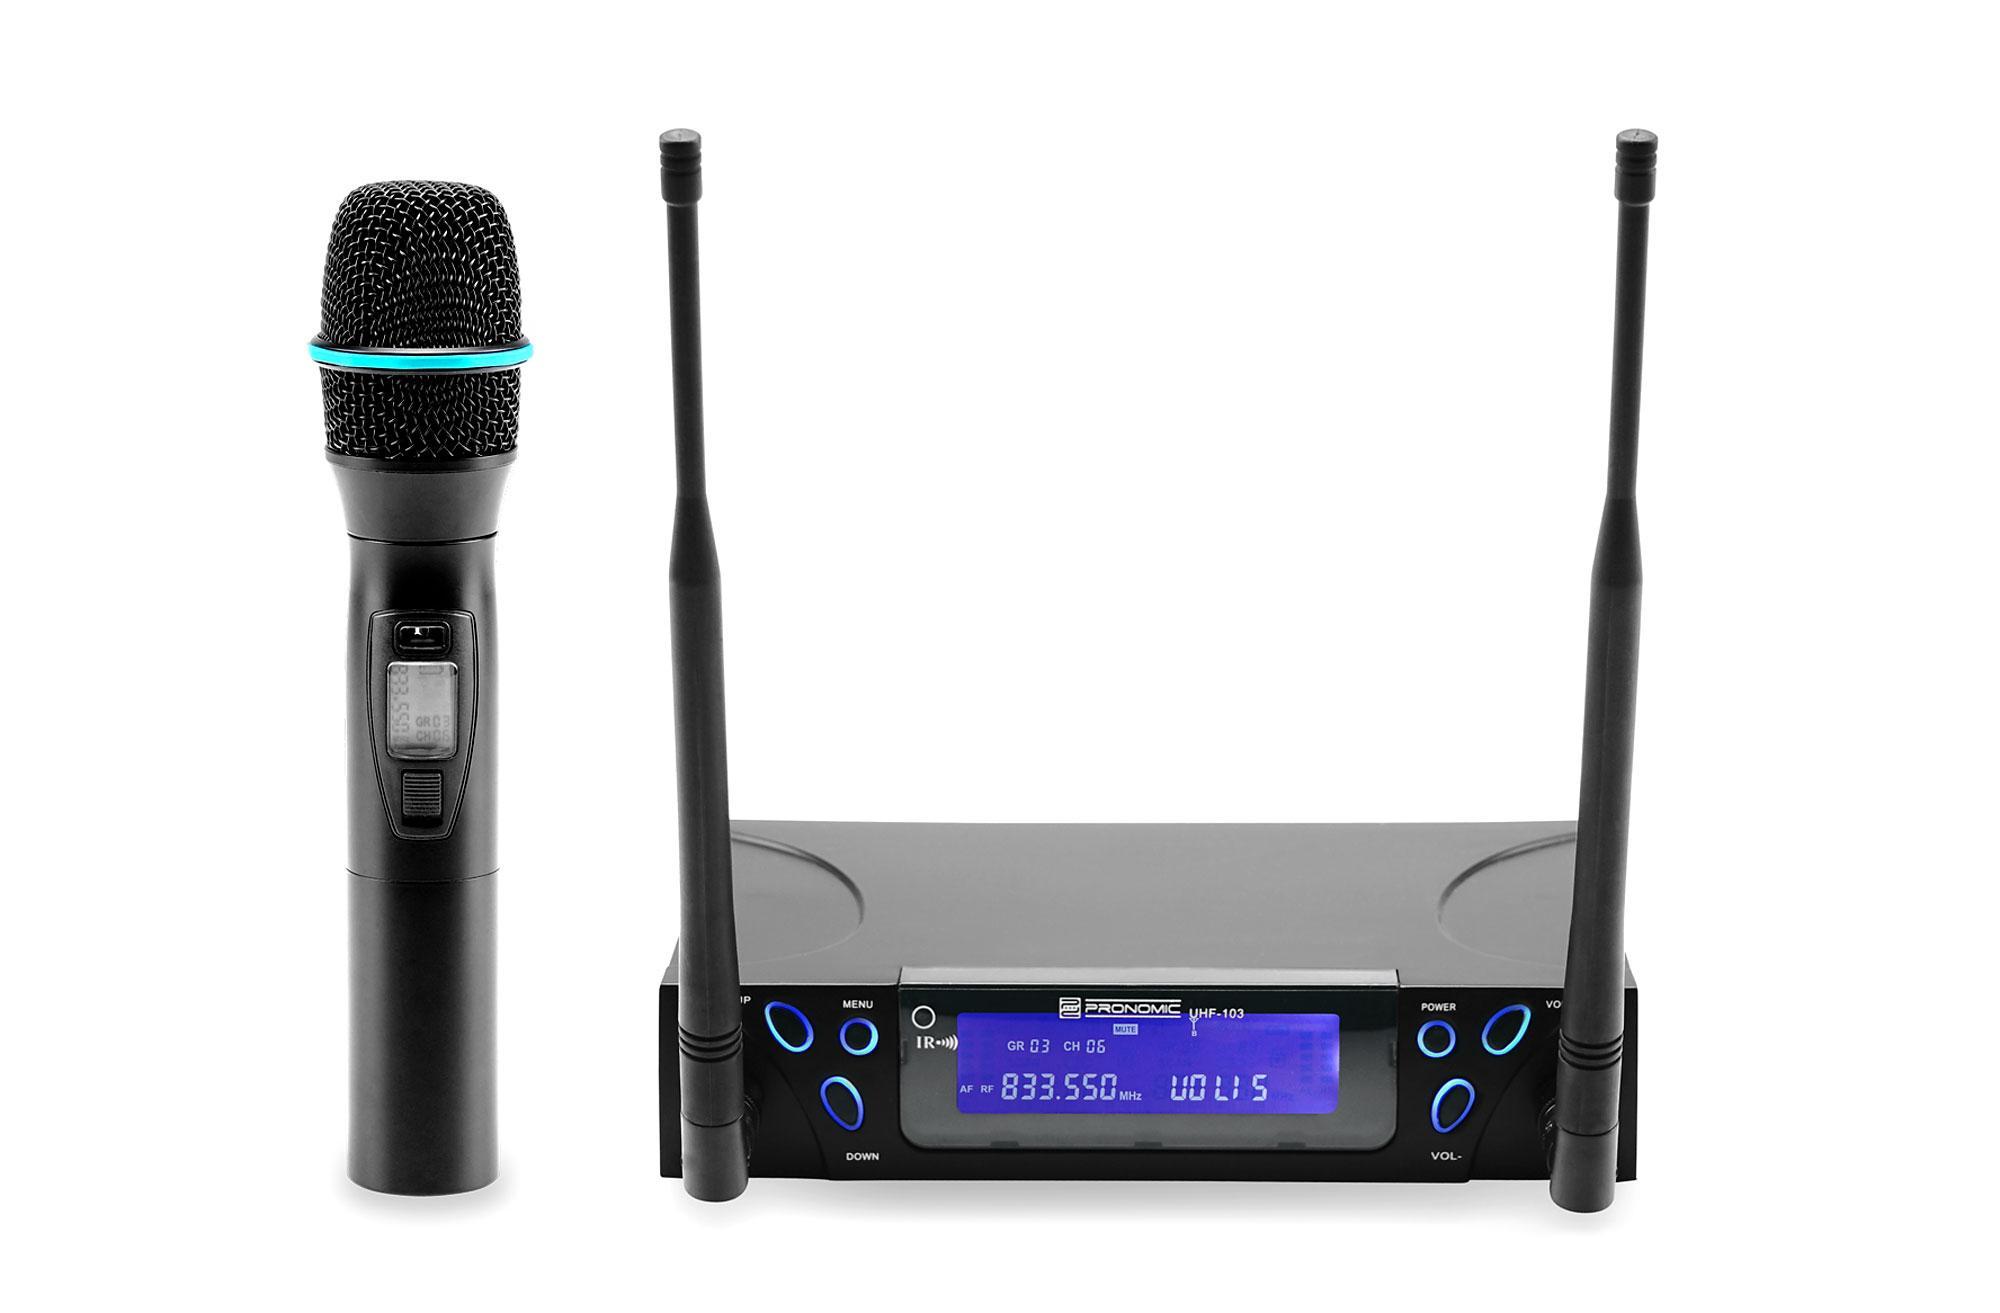 Pronomic UHF 103 True Diversity Hand Funkmikrofon Set Retoure (Zustand sehr gut)